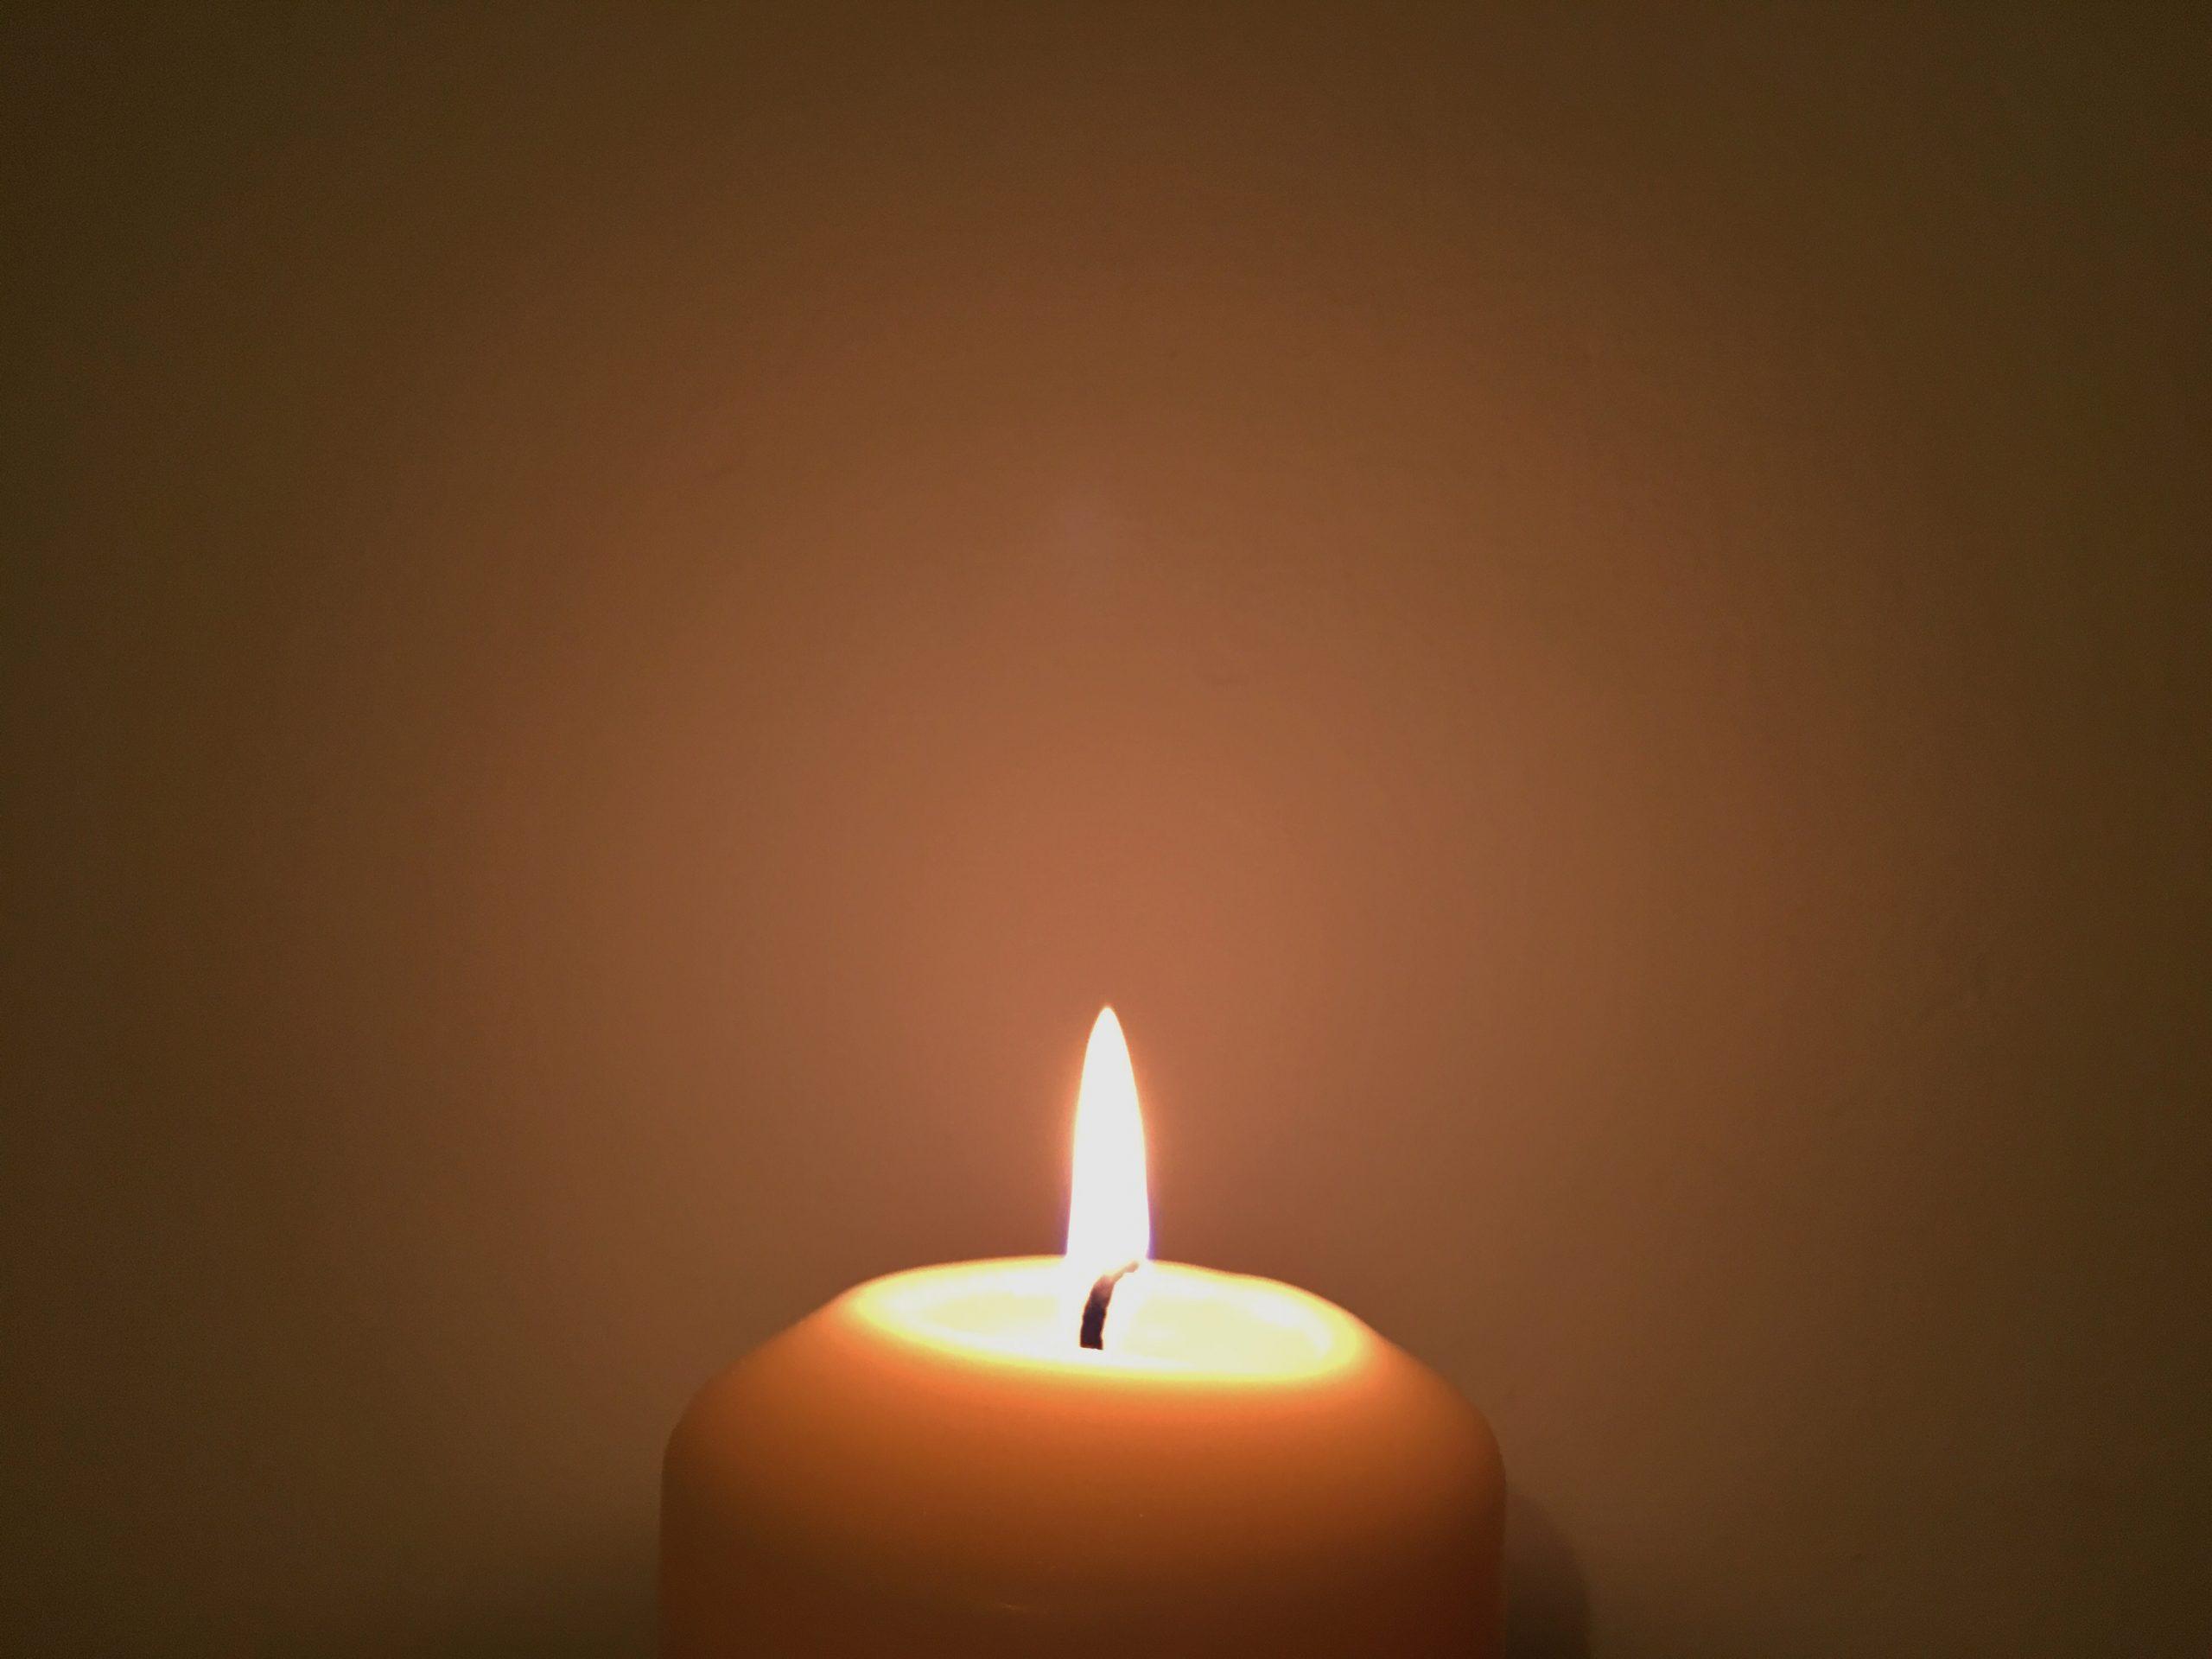 Members show generosity in support of family of deceased OPG colleague